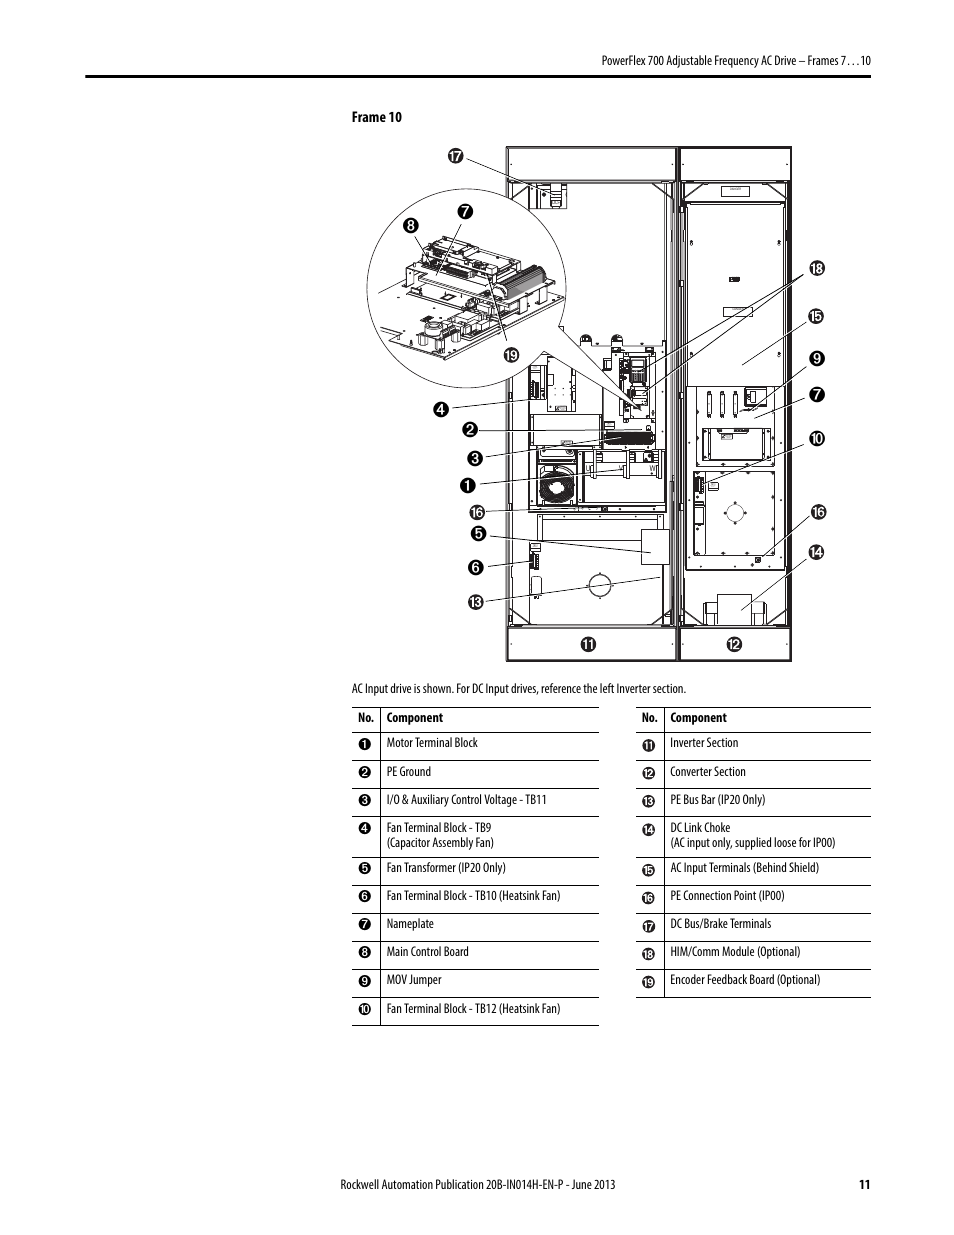 Powerflex 700 Wiring Diagram Brake Dc Starting Know About Aqualink Rockwell Automation 20d Installation Instructions Rh Manualsdir Com